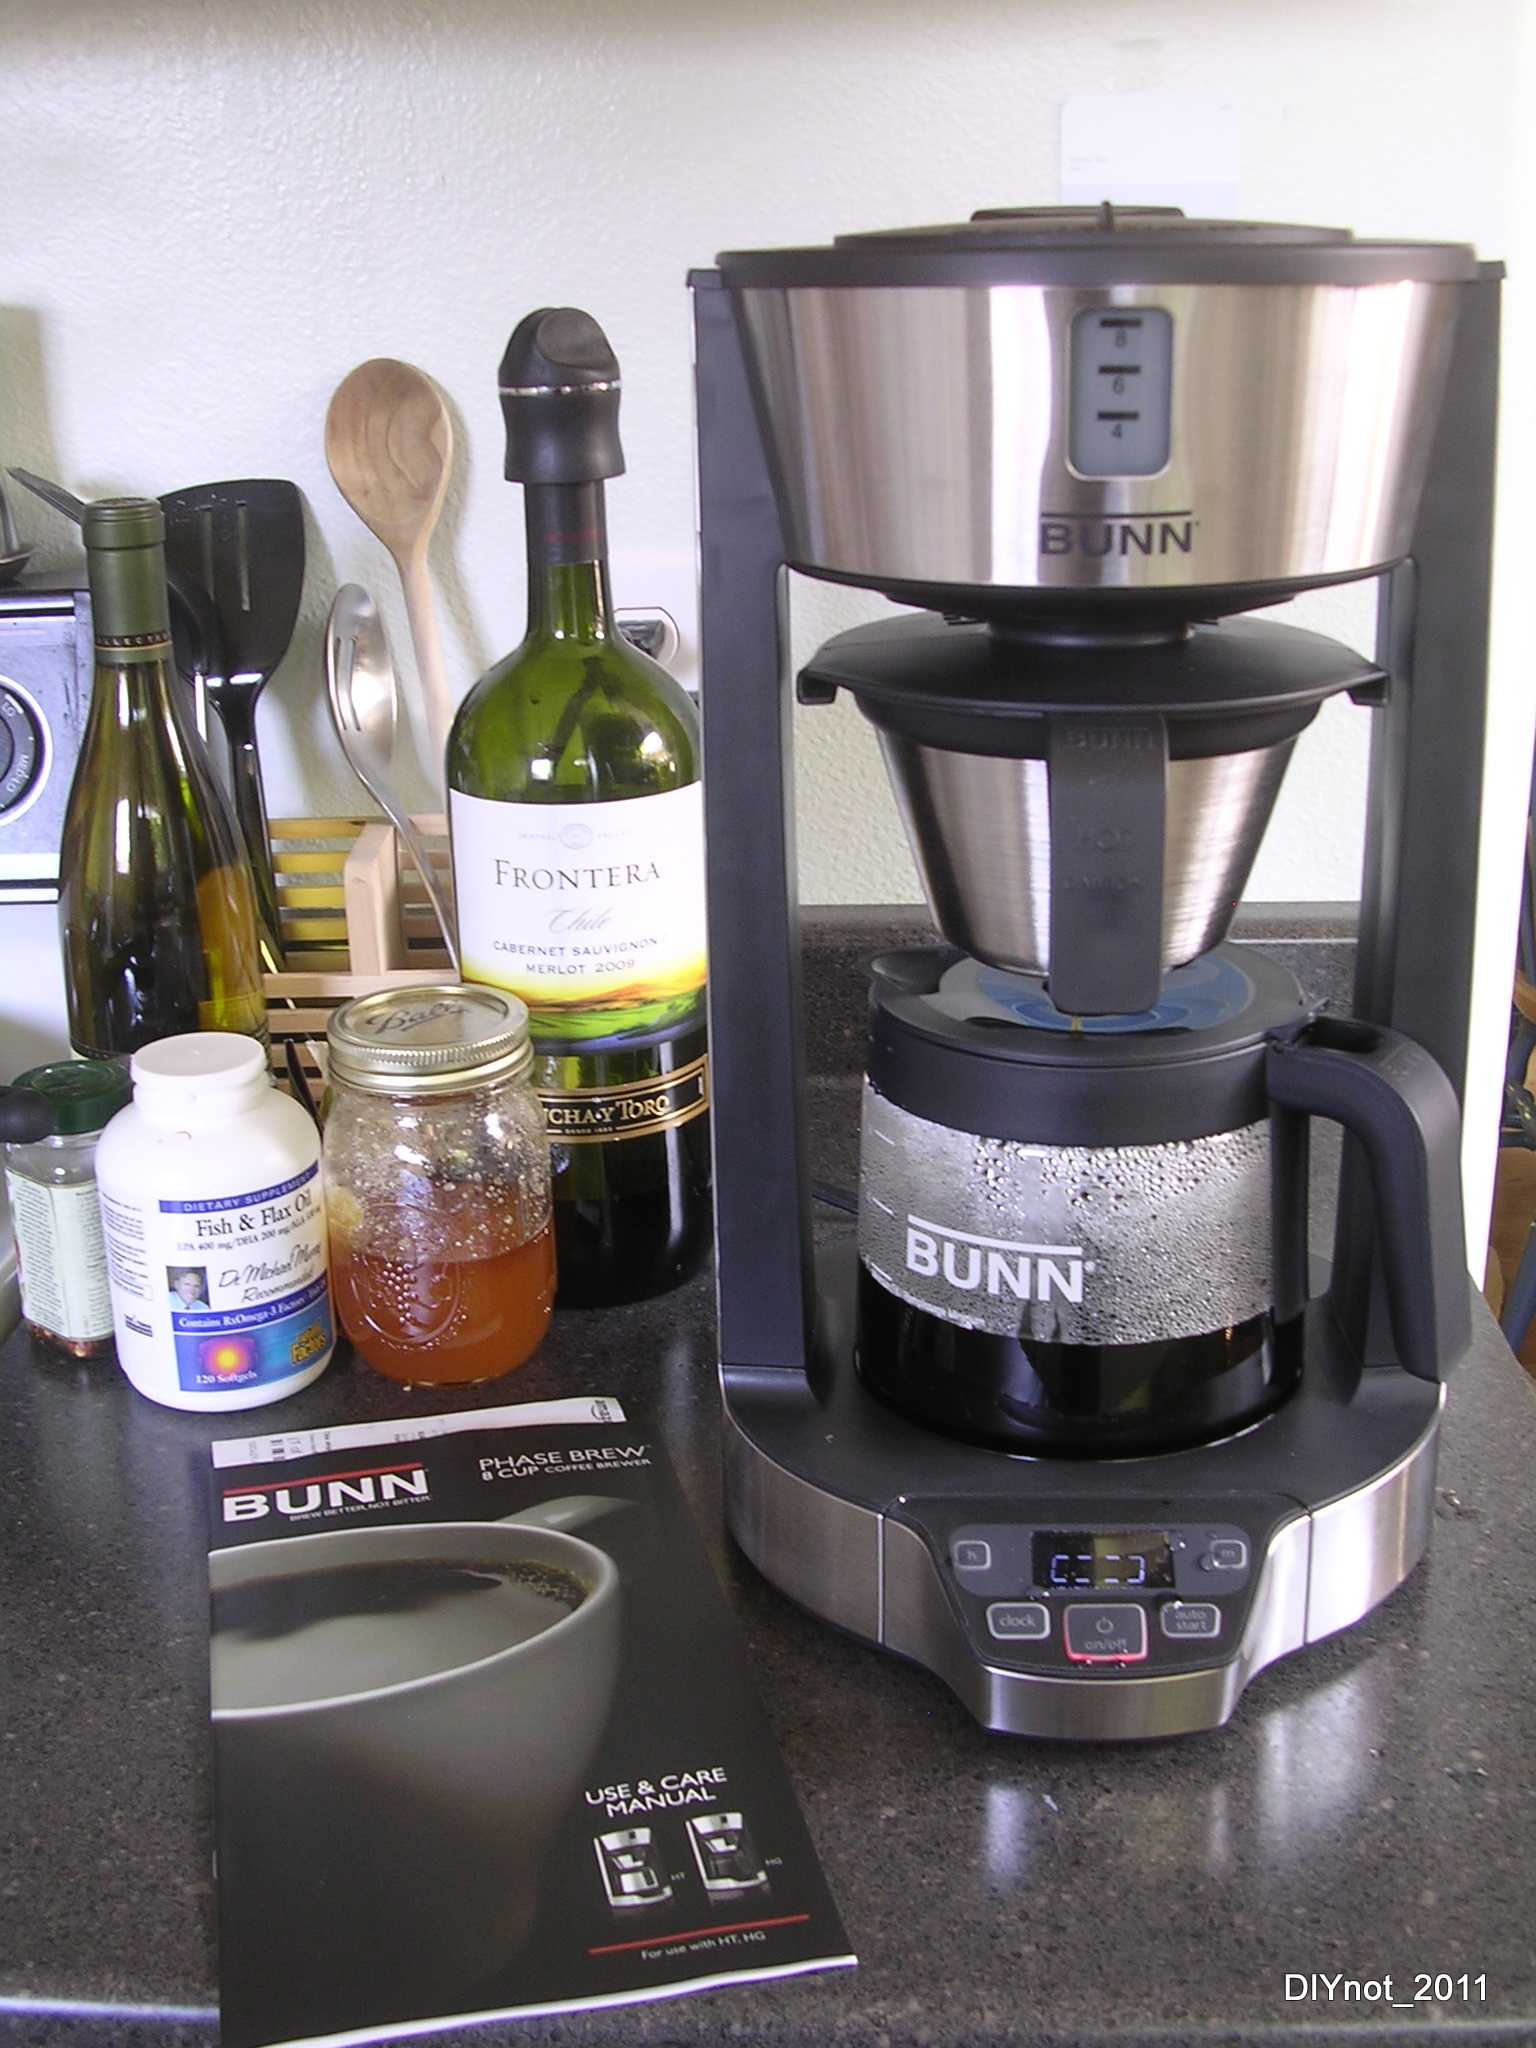 Bunn Coffee Maker Hg Manual : My Favorite (New) Coffee Maker